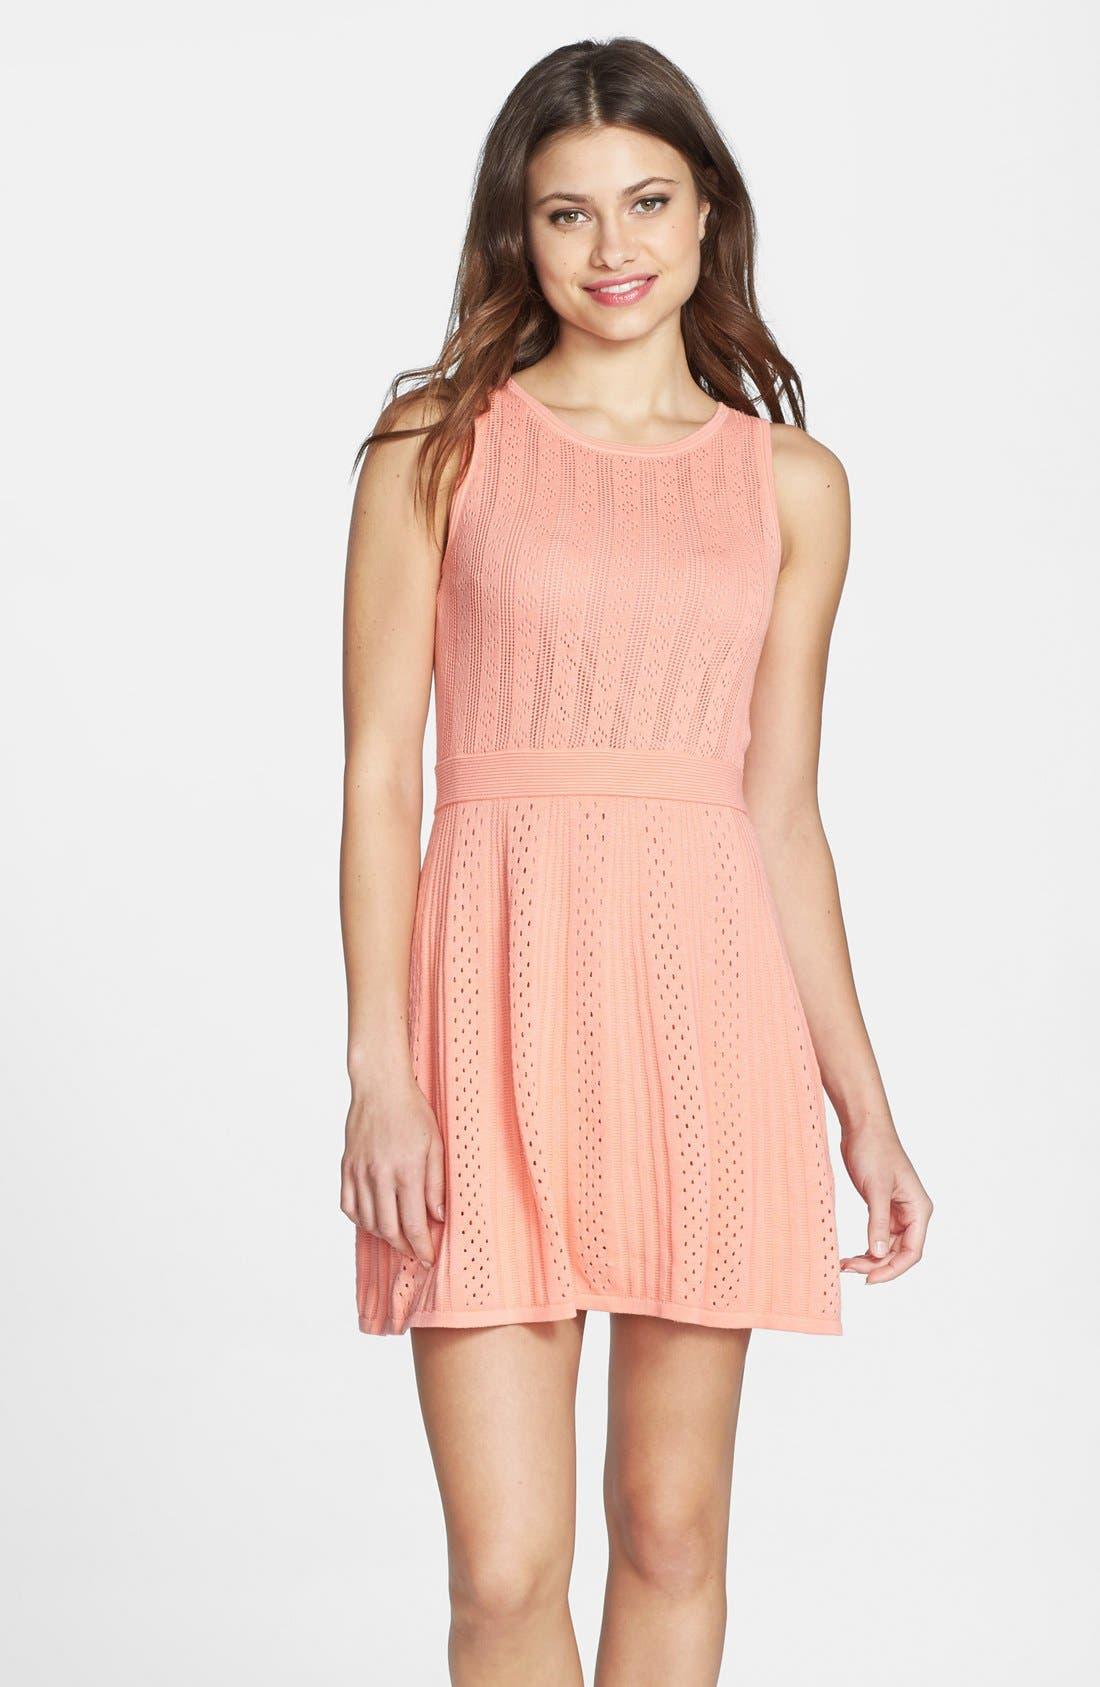 Main Image - Trina Trina Turk 'Marcela' Cotton Pointelle Knit Dress